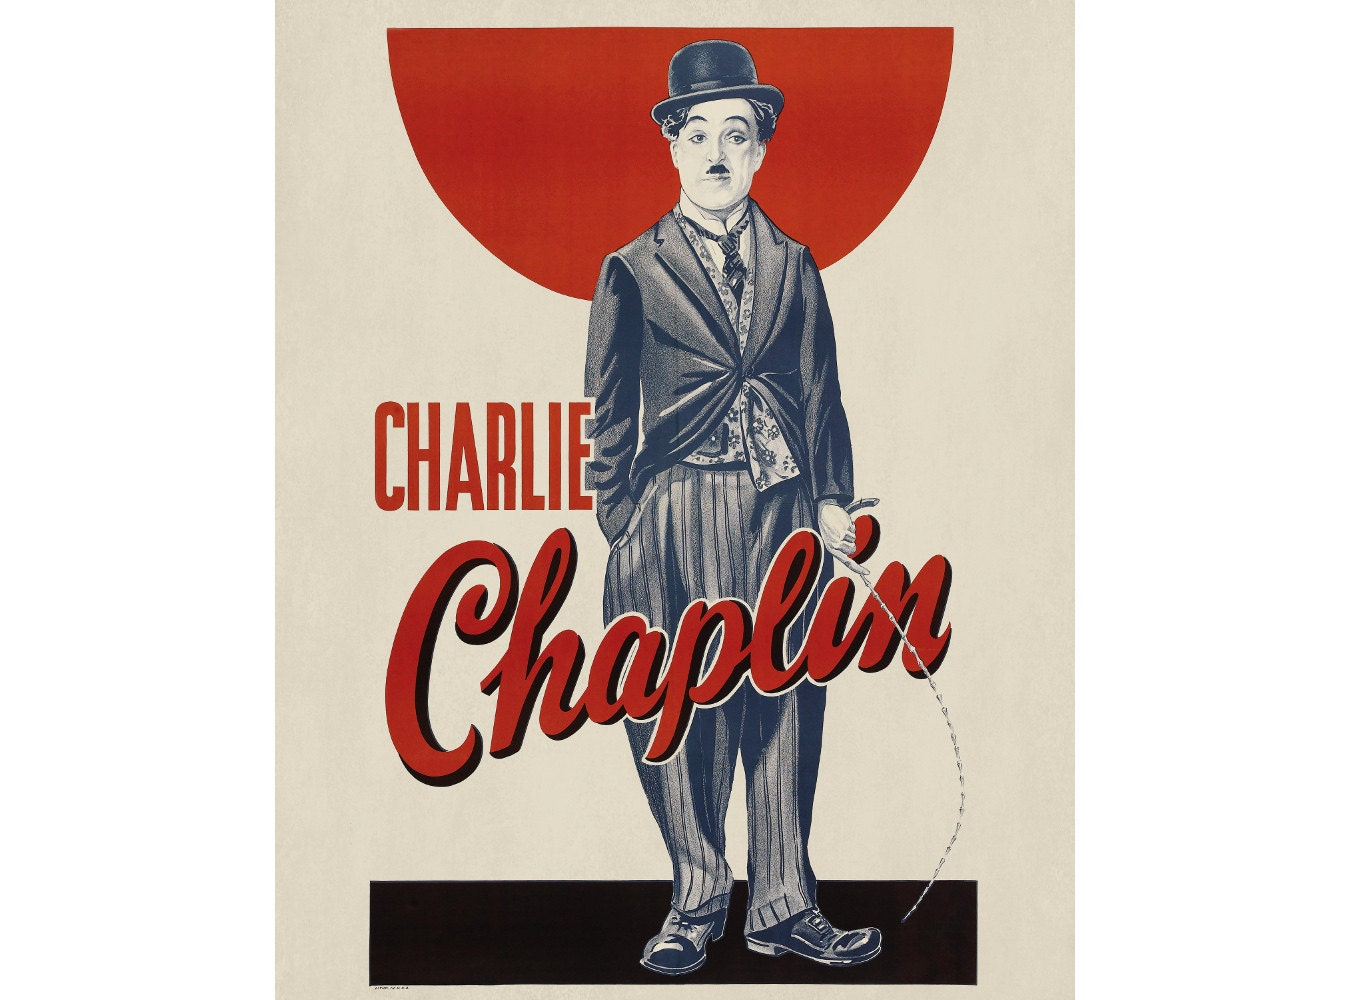 Charlie Chaplin Movie Poster Vintage Charlie by ...